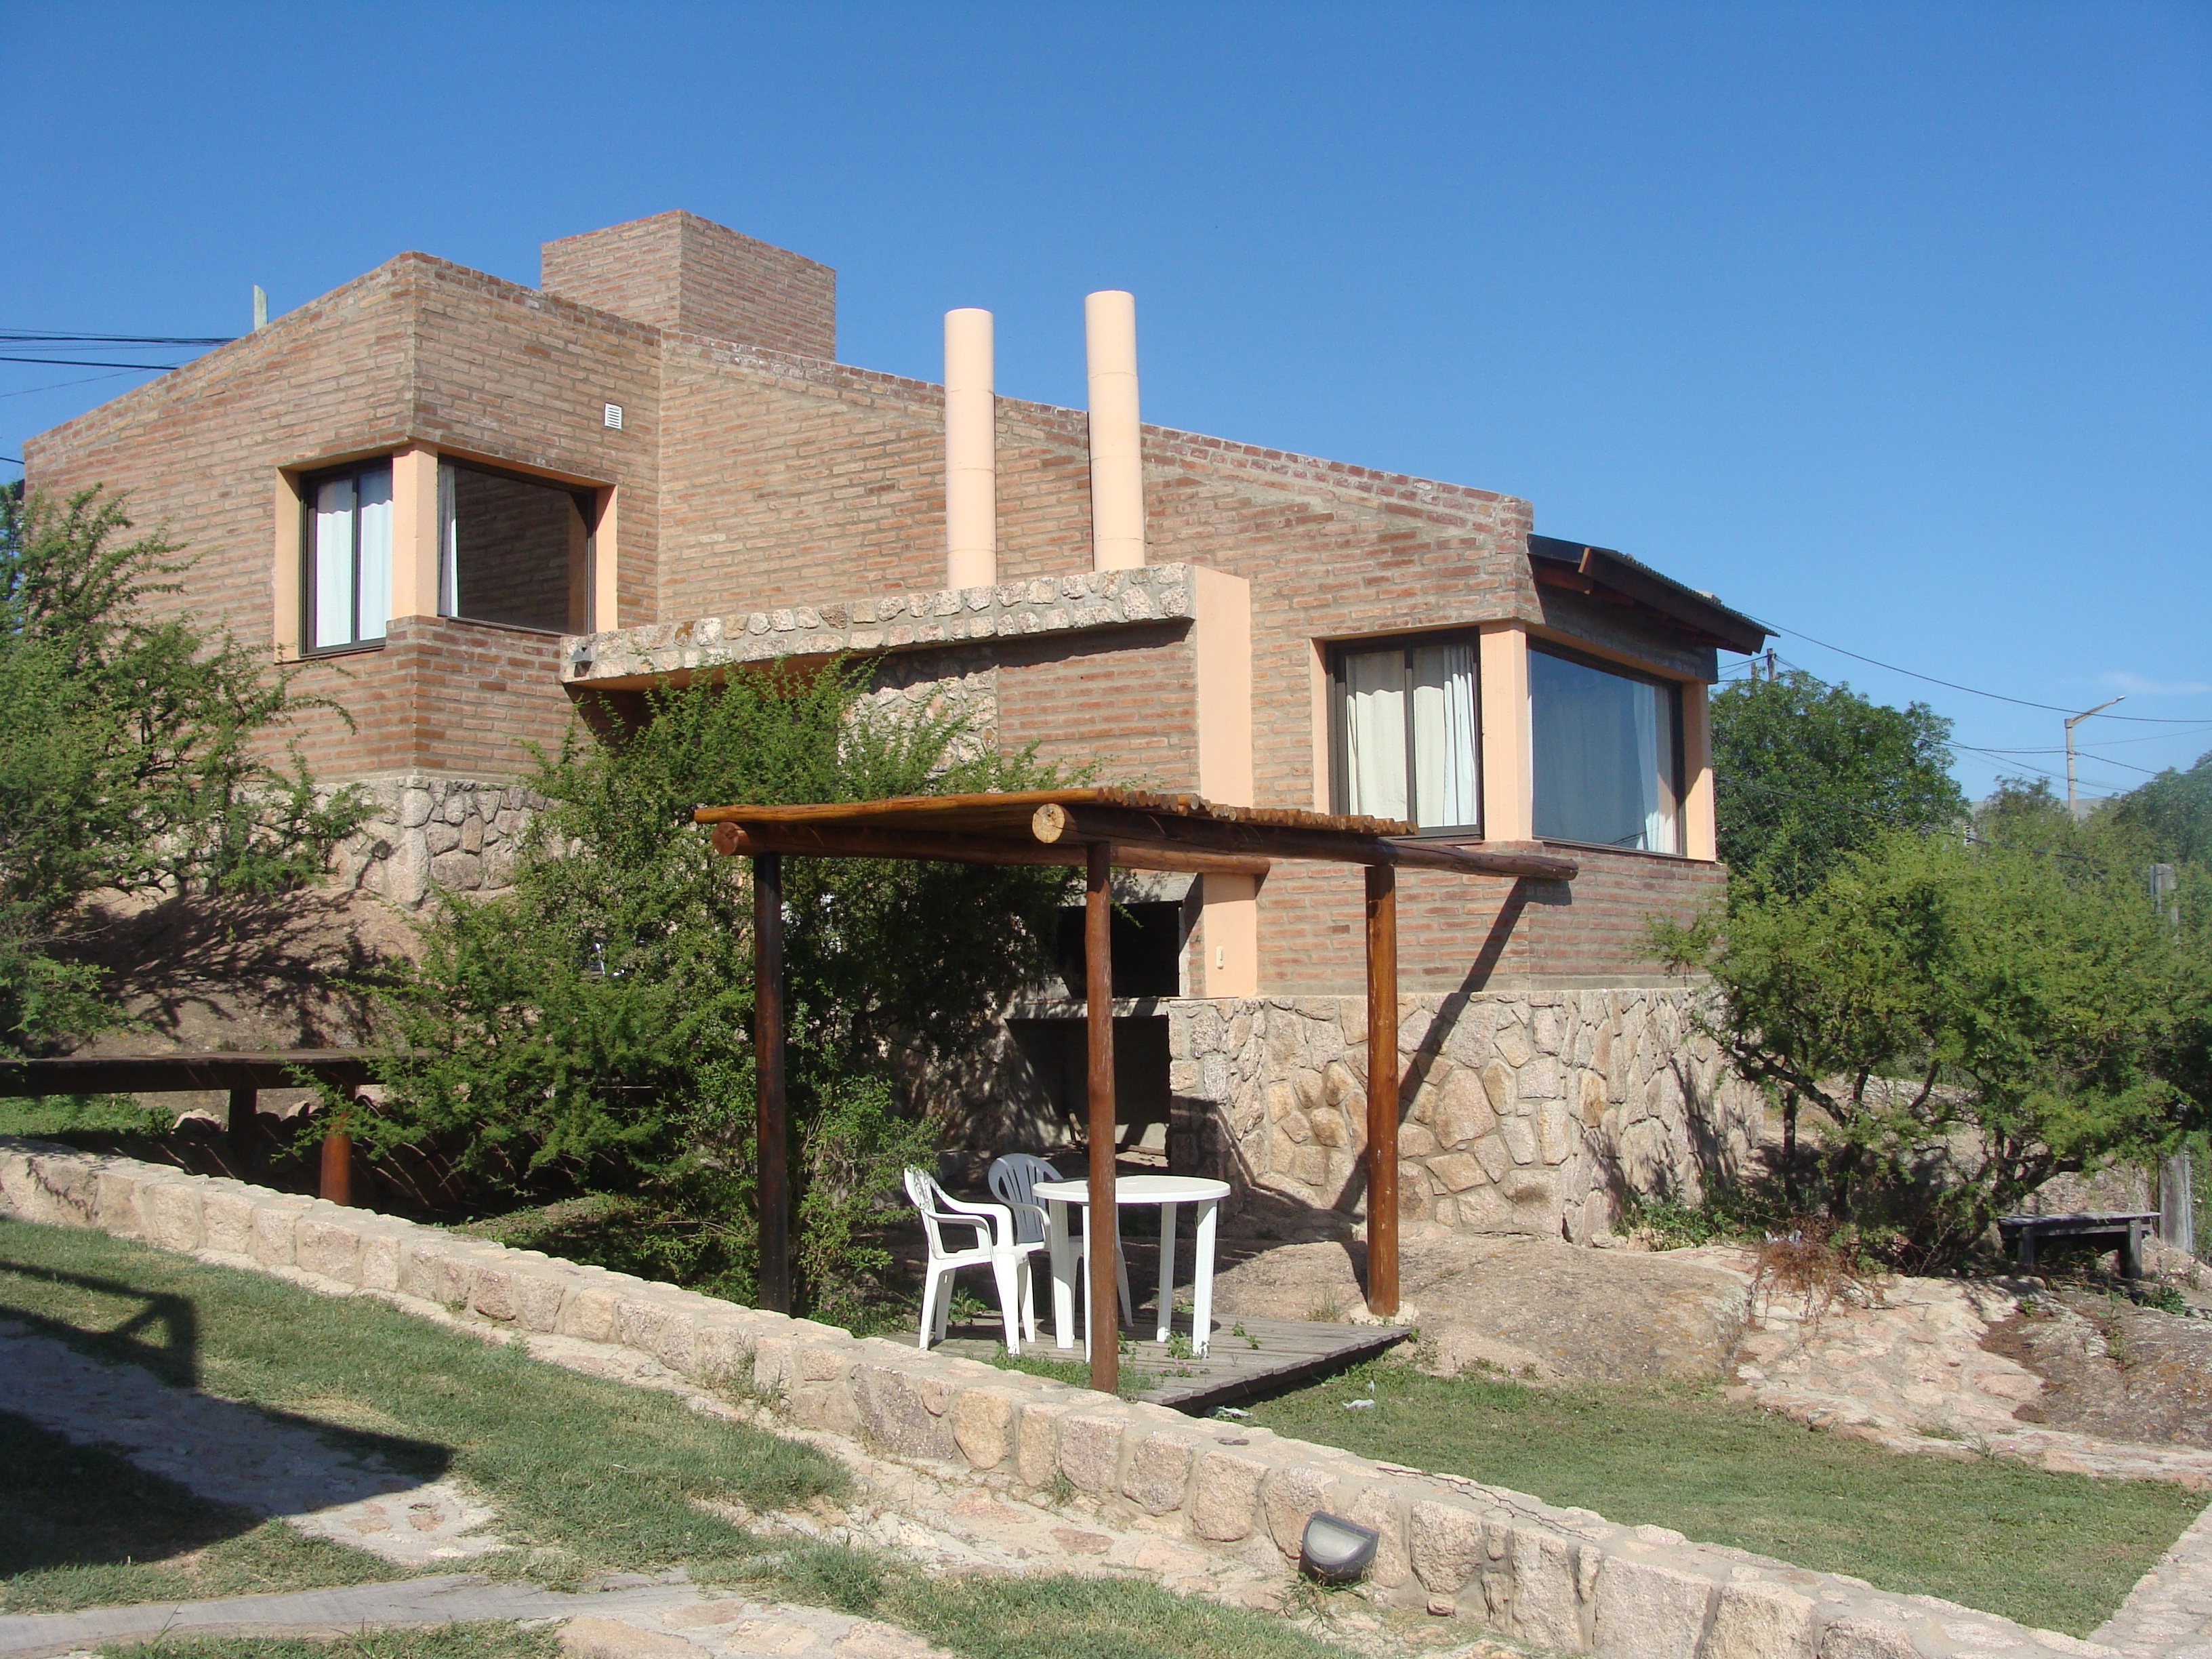 For sale house villa carlos paz cordoba argentina for Villas en argentina